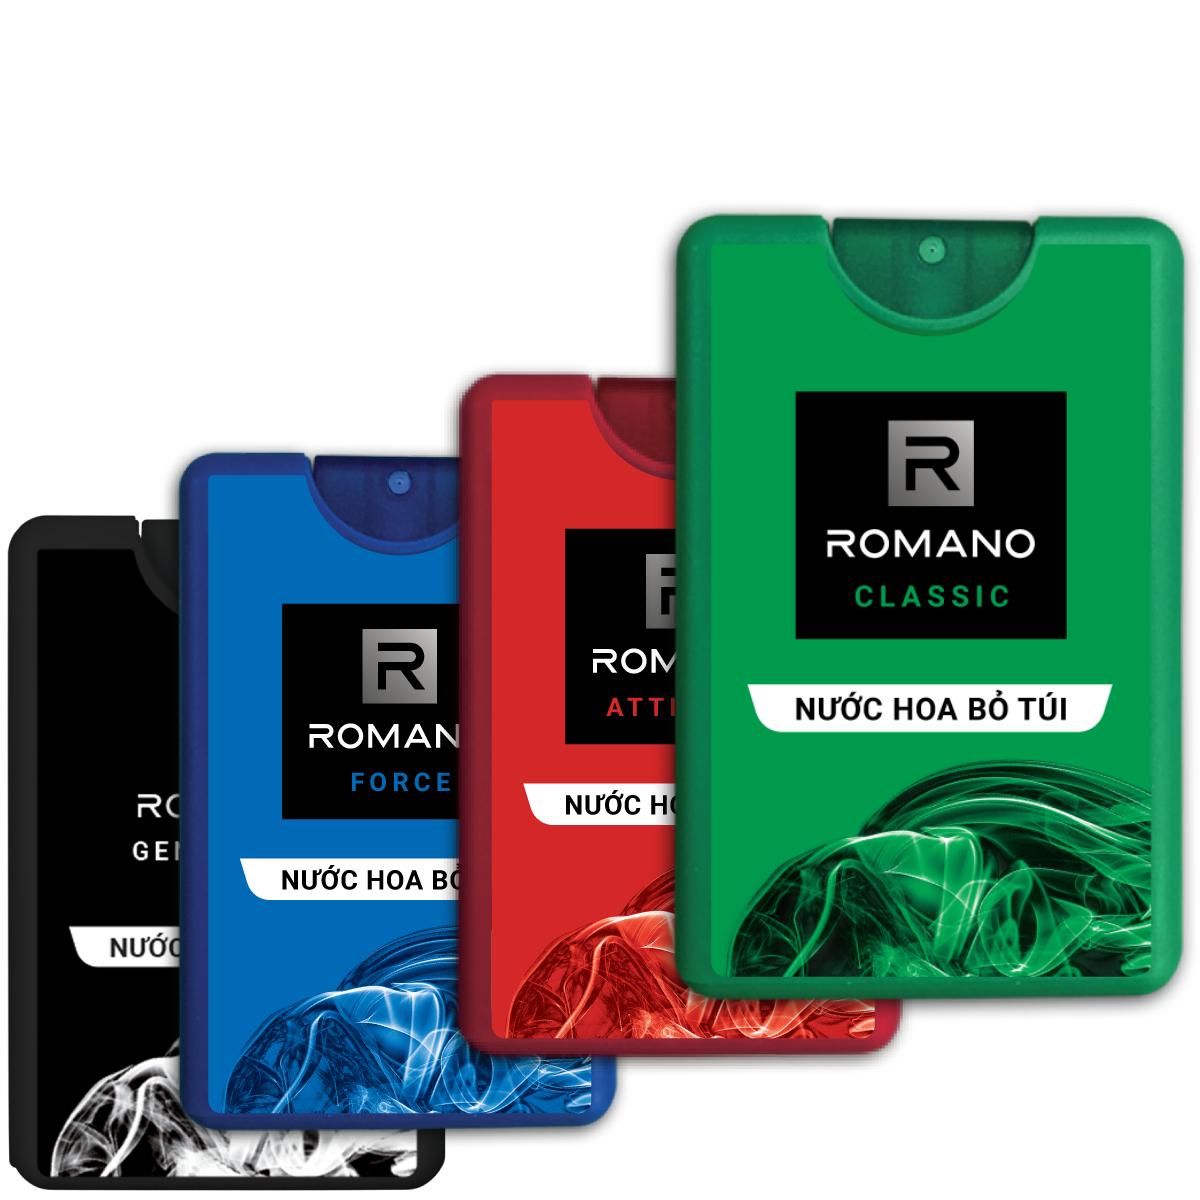 Combo 4 Nước hoa bỏ túi Romano 18ml Classic & Force & Attitude & Gentleman